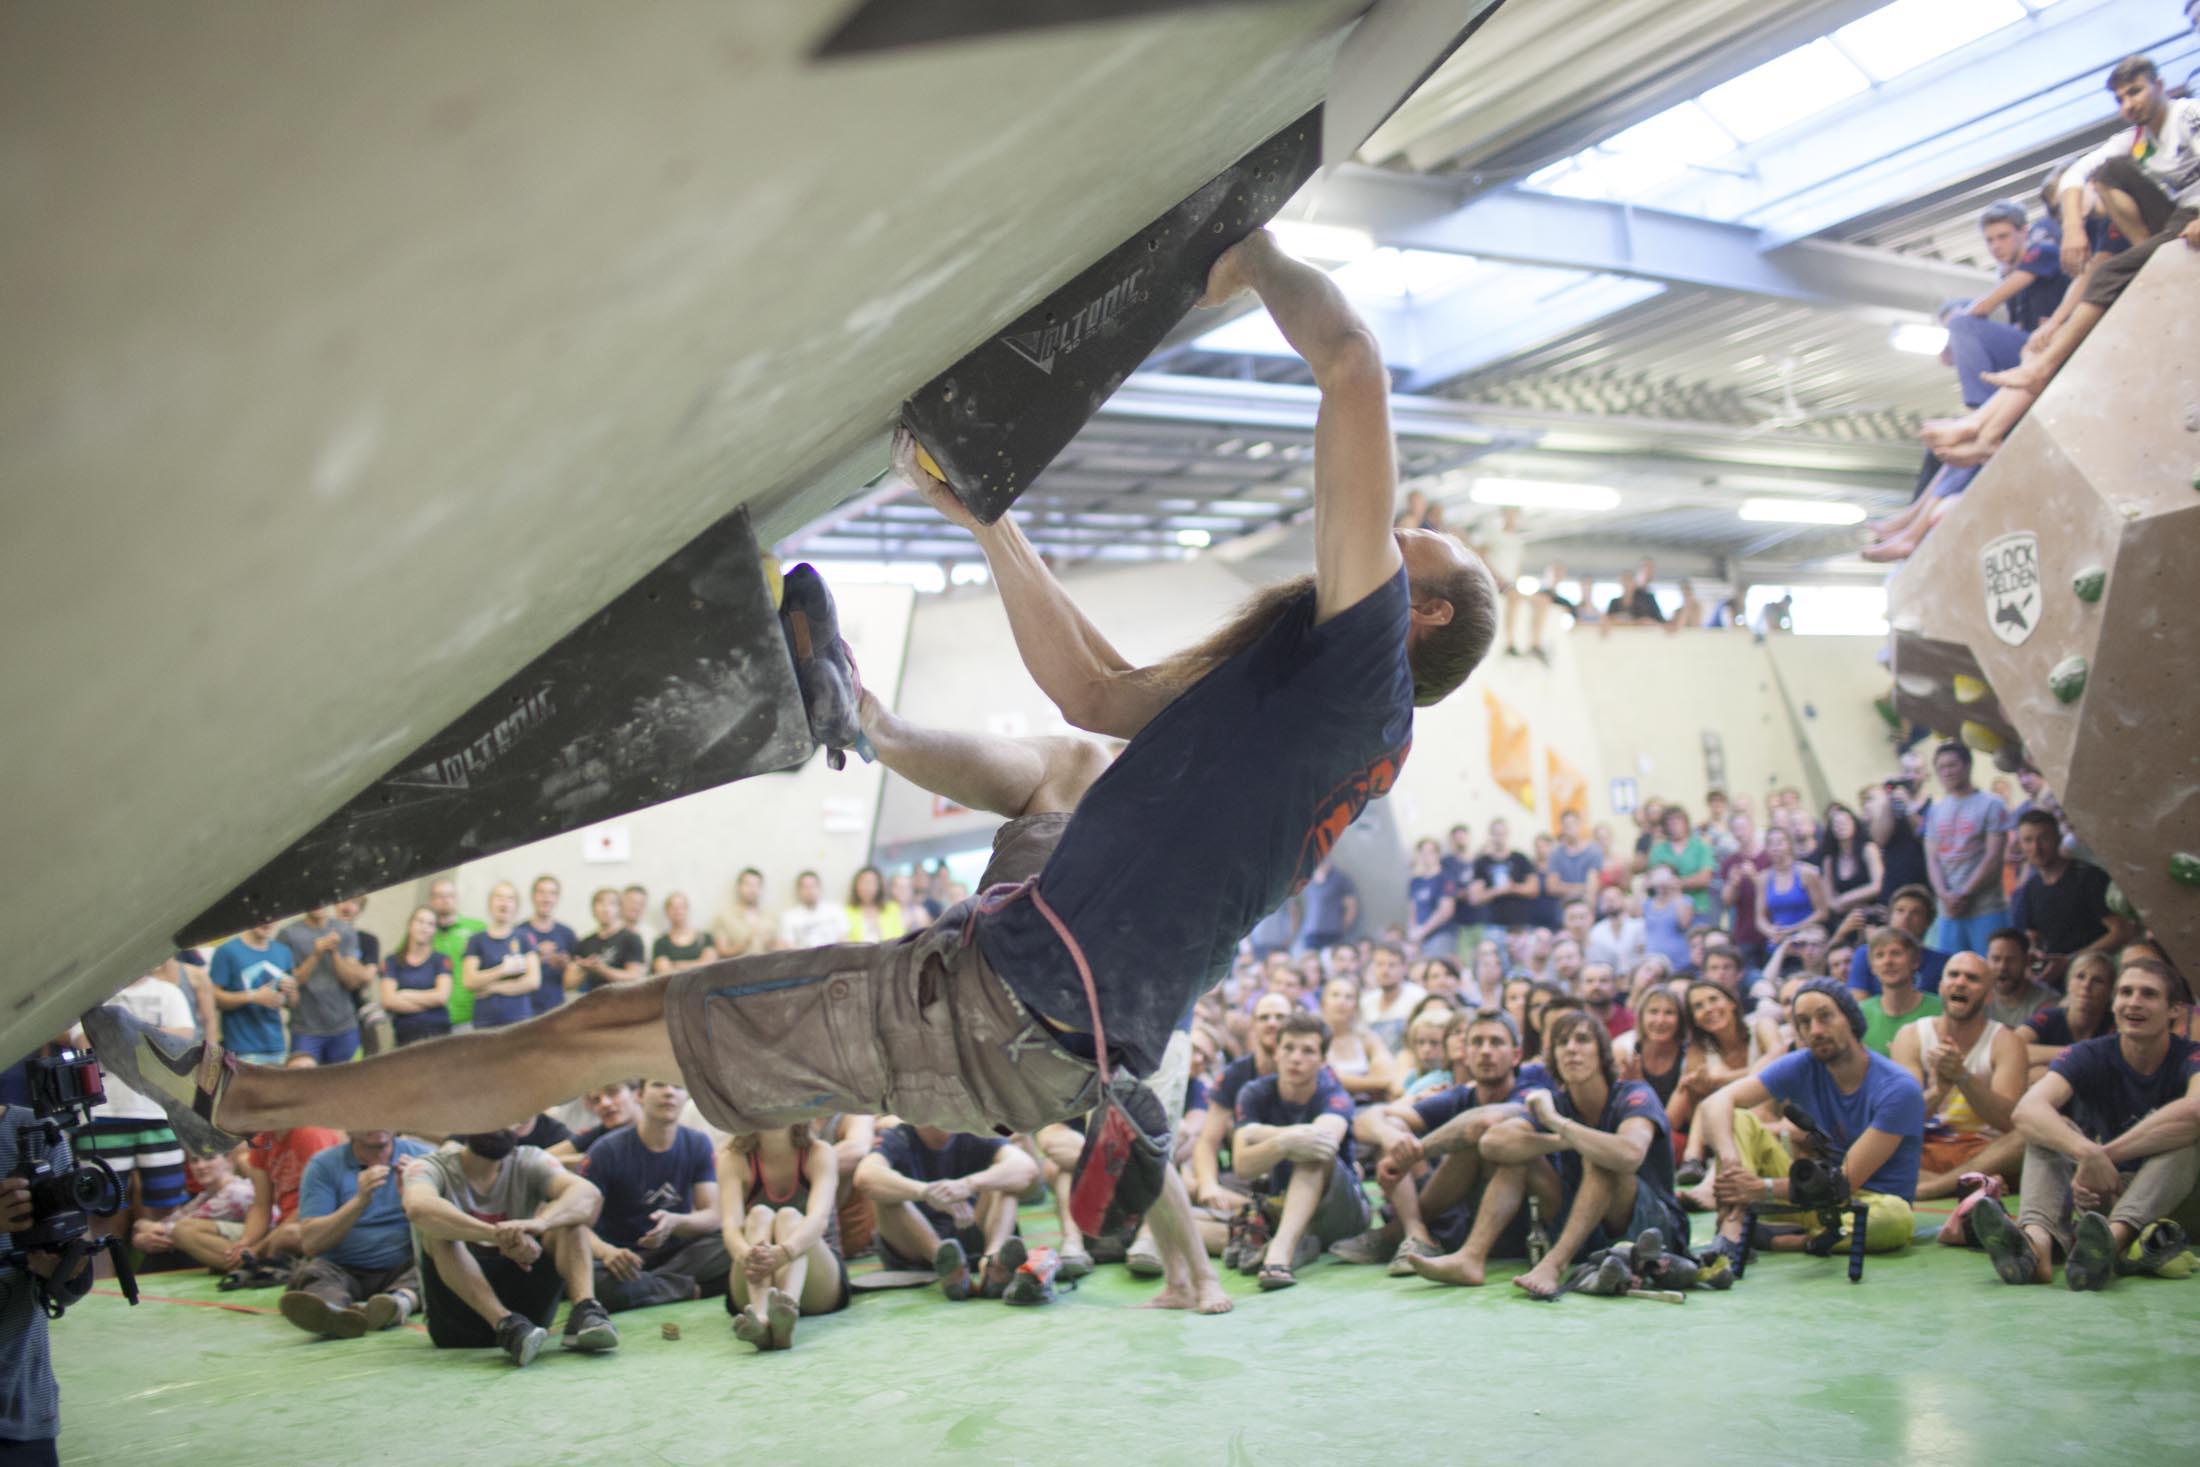 Finale, internationaler bouldercup Frankenjura 2016, BLOCKHELDEN Erlangen, Mammut, Bergfreunde.de, Boulderwettkampf07092016716